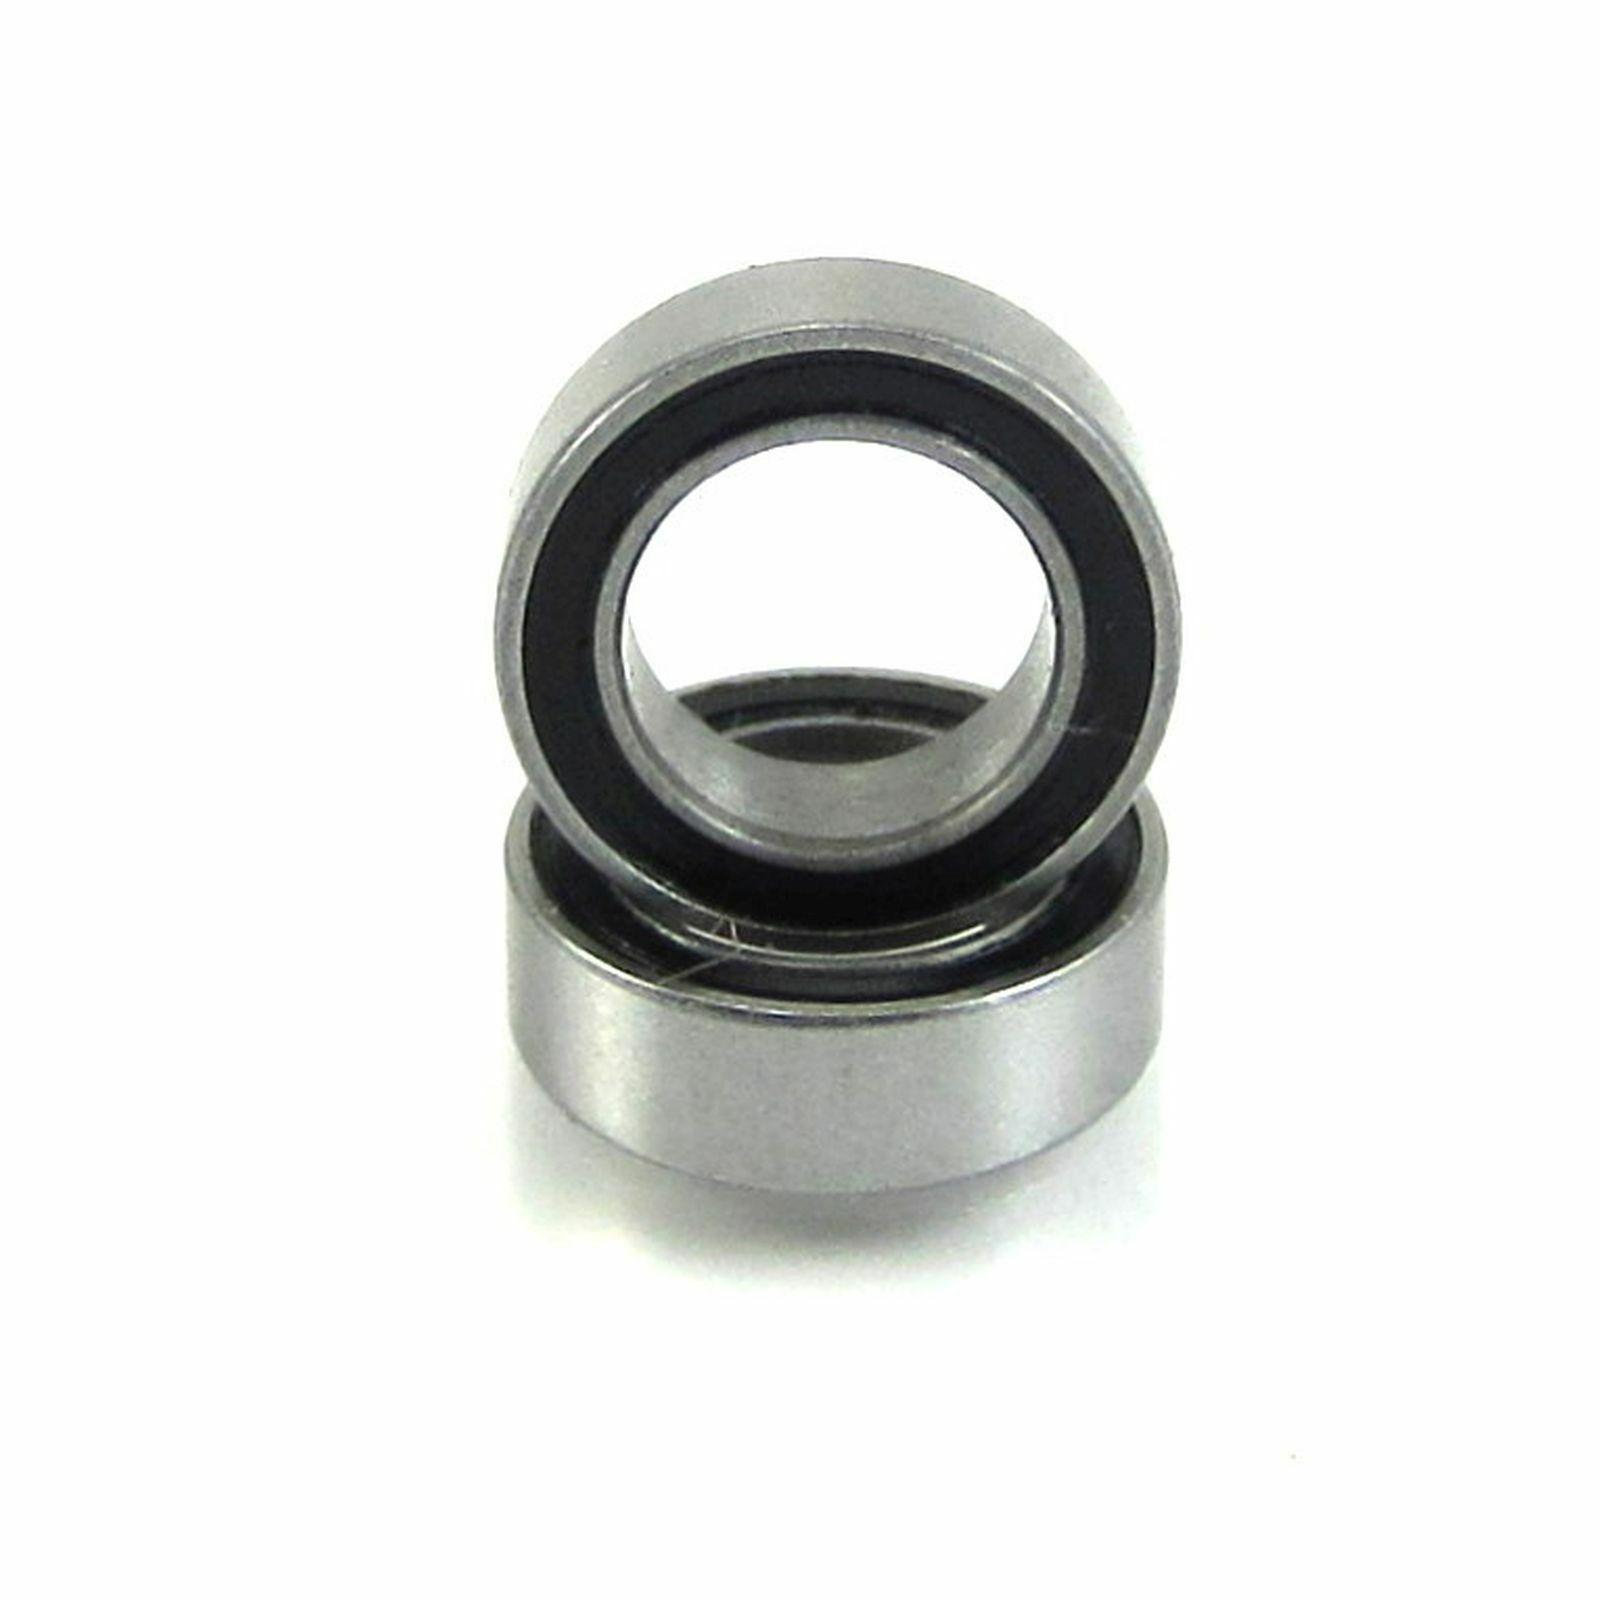 440c Stainless Steel Ball Bearing Bearings MR105ZZ QTY 10 SMR105ZZ 5x10x4 mm